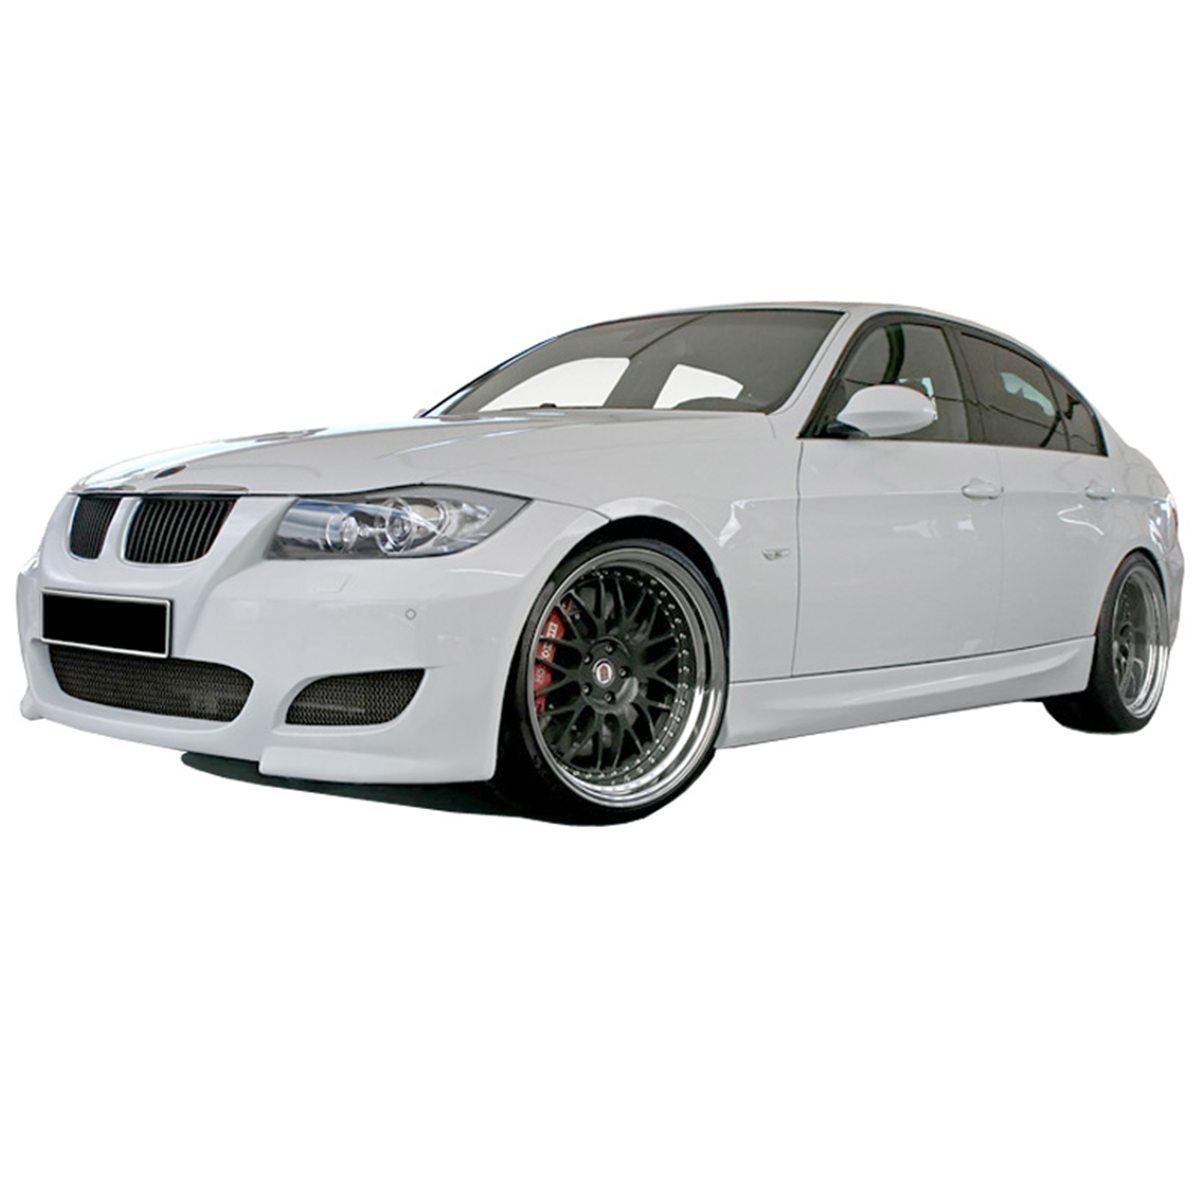 BMW-E90-Polaris-frt-PCS034